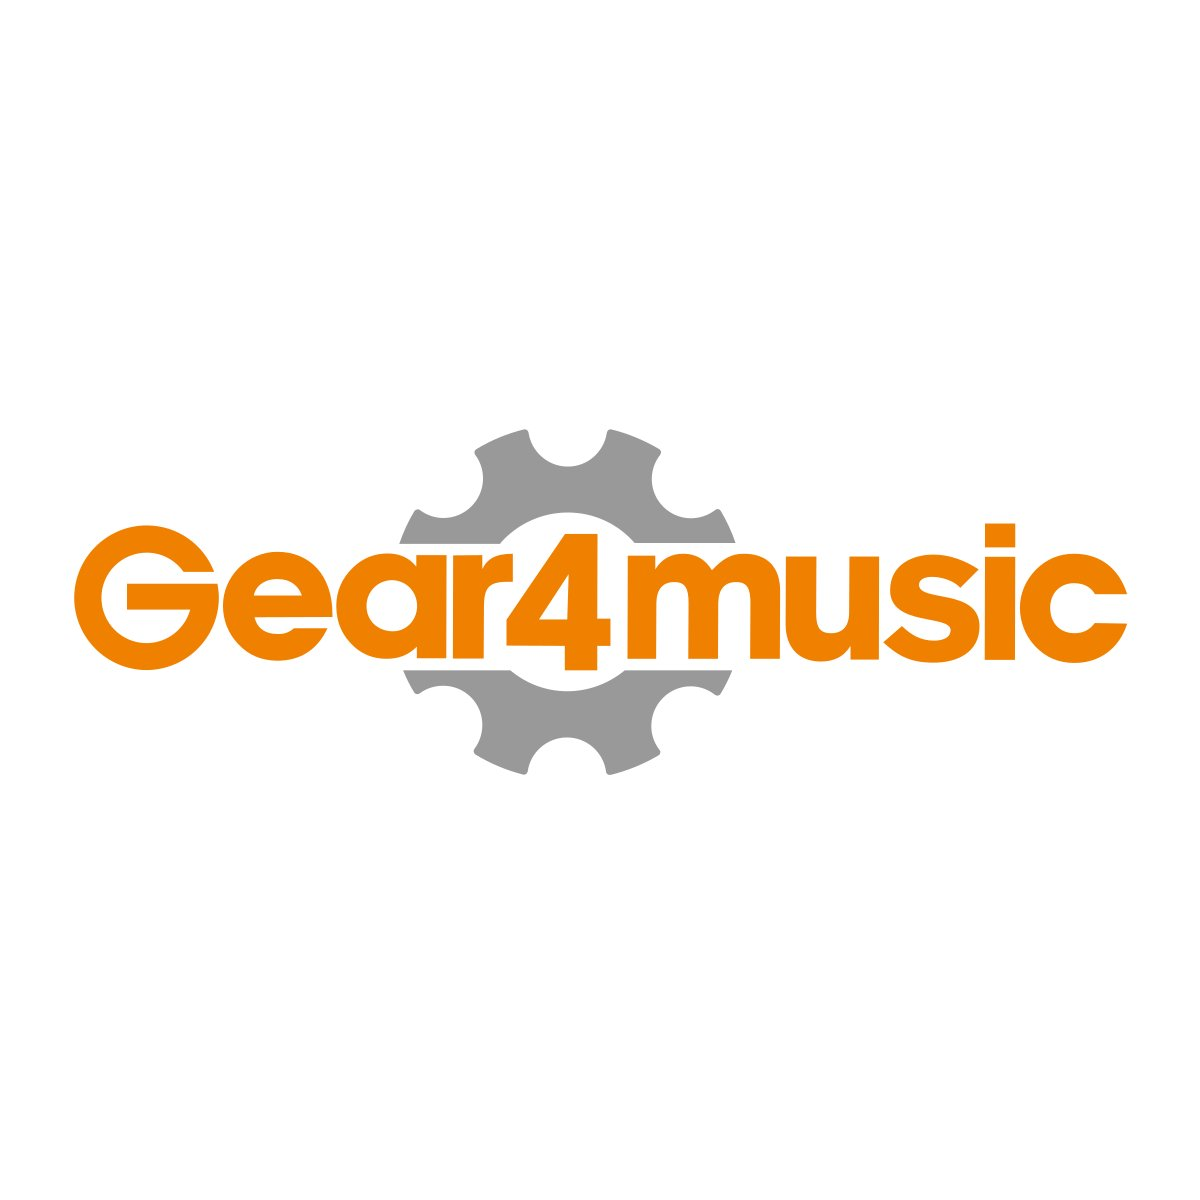 Shop now | JDP-1 Junior Digital Piano by Gear4music, White